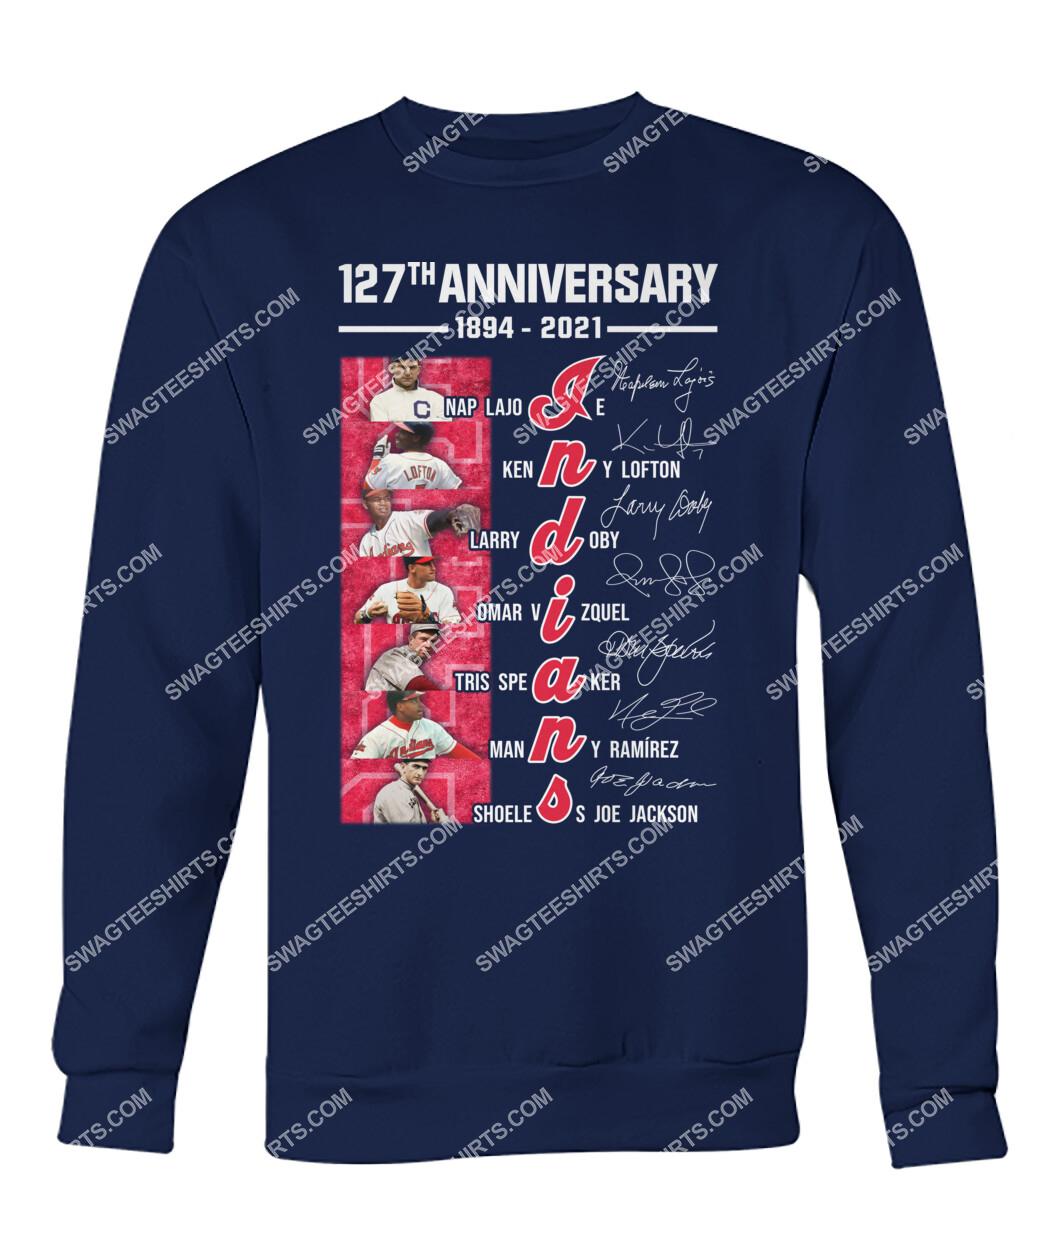 the cleveland indians 127th anniversary 1894 2021 signatures mlb sweatshirt 1